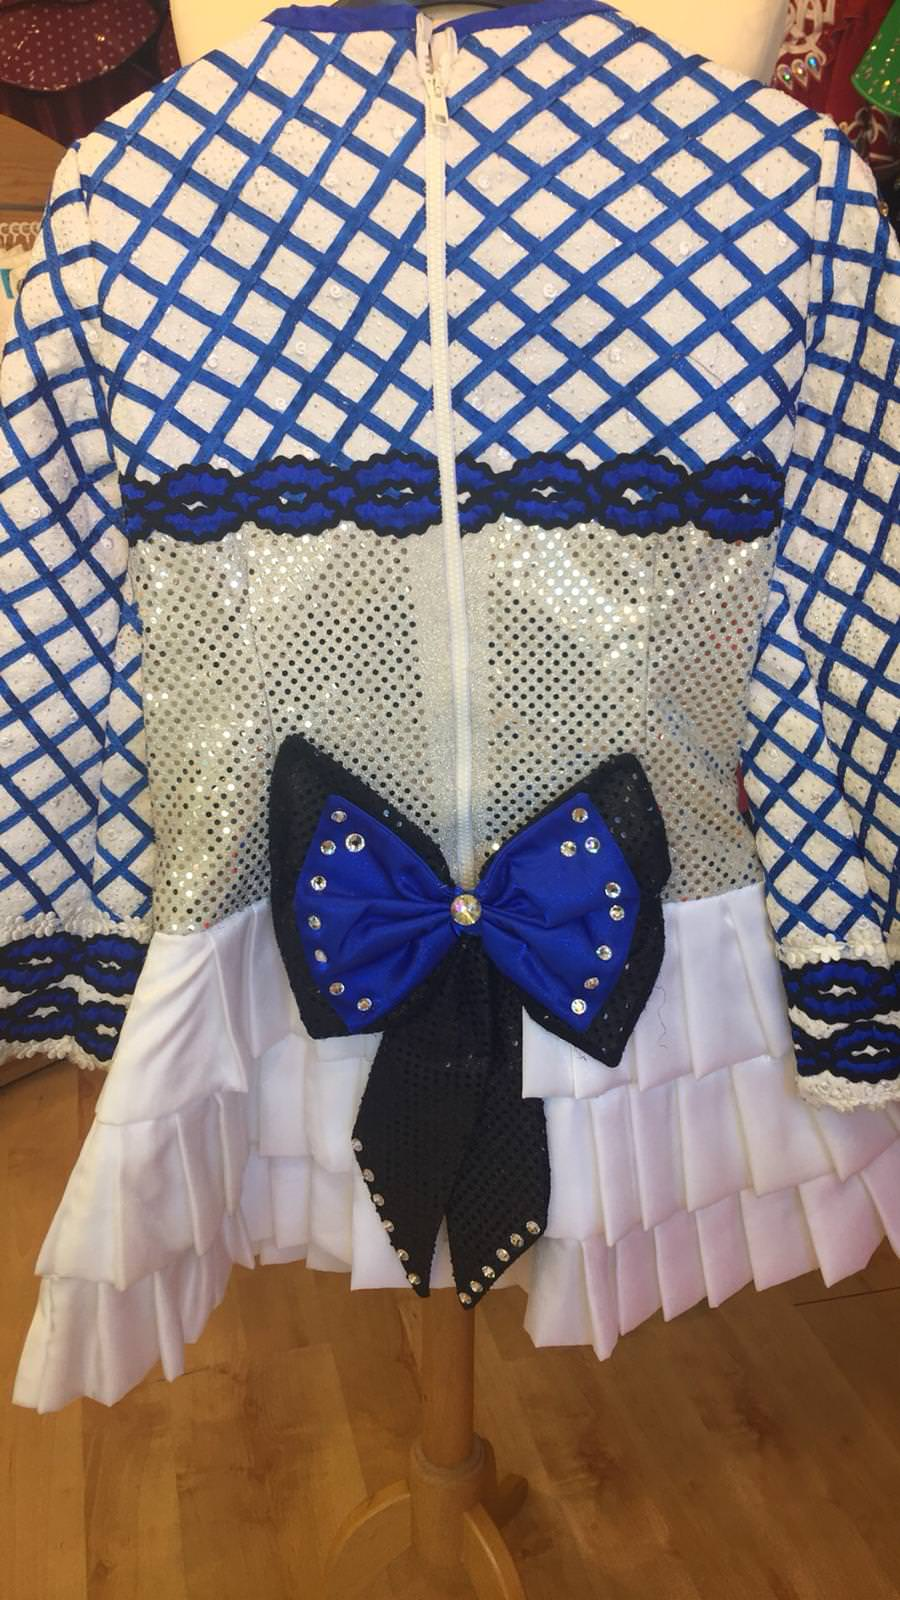 White, Blue and Black Dress